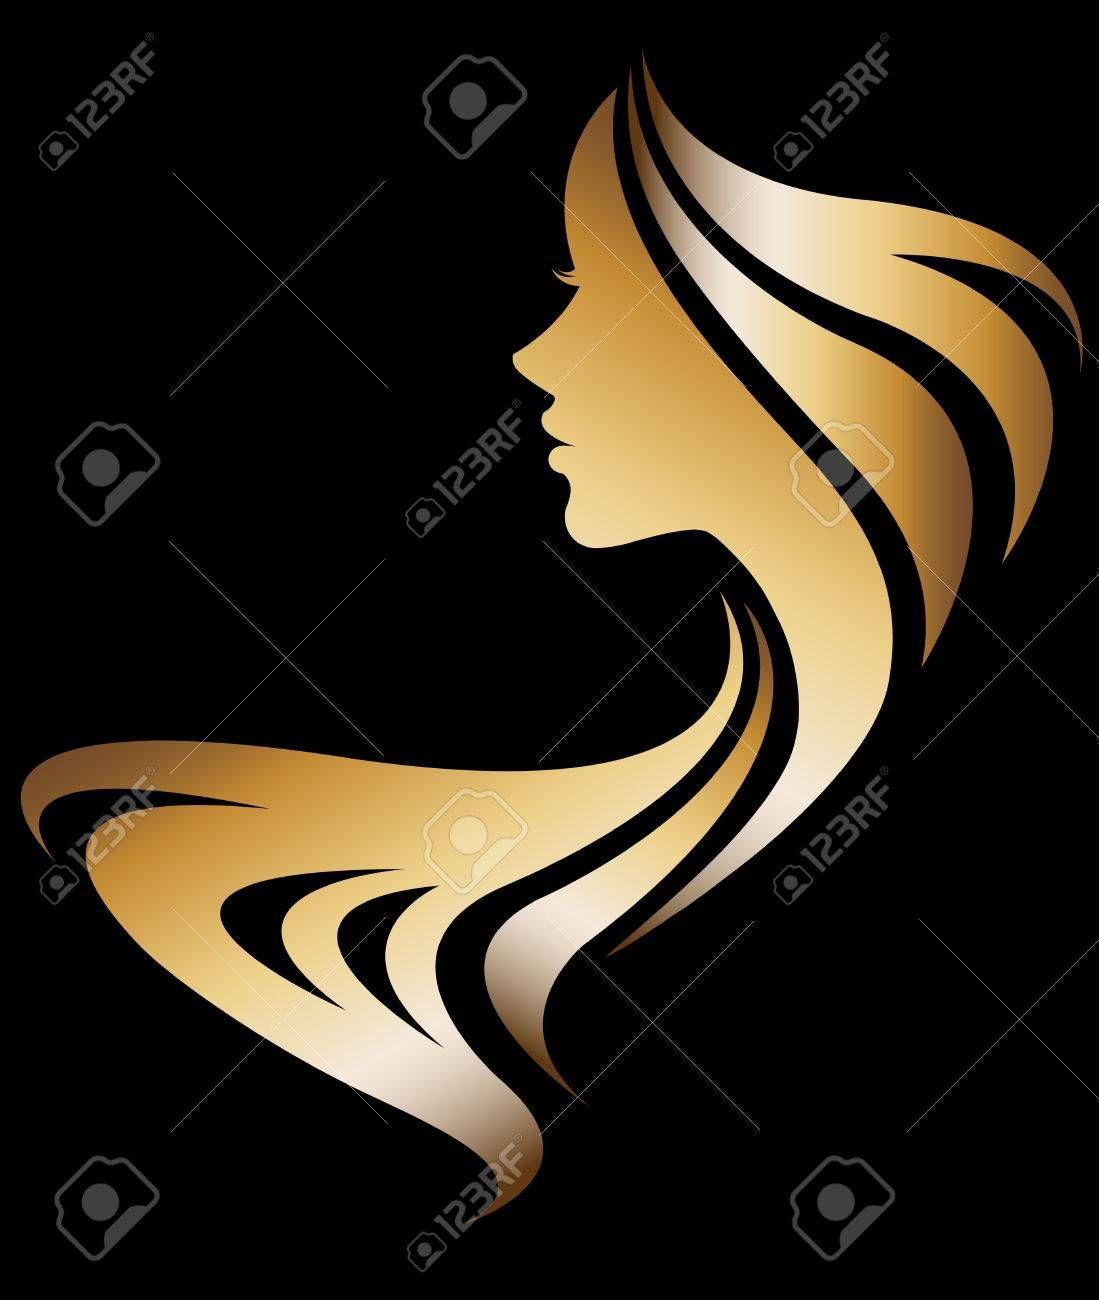 illustration vector of women silhouette golden icon, women